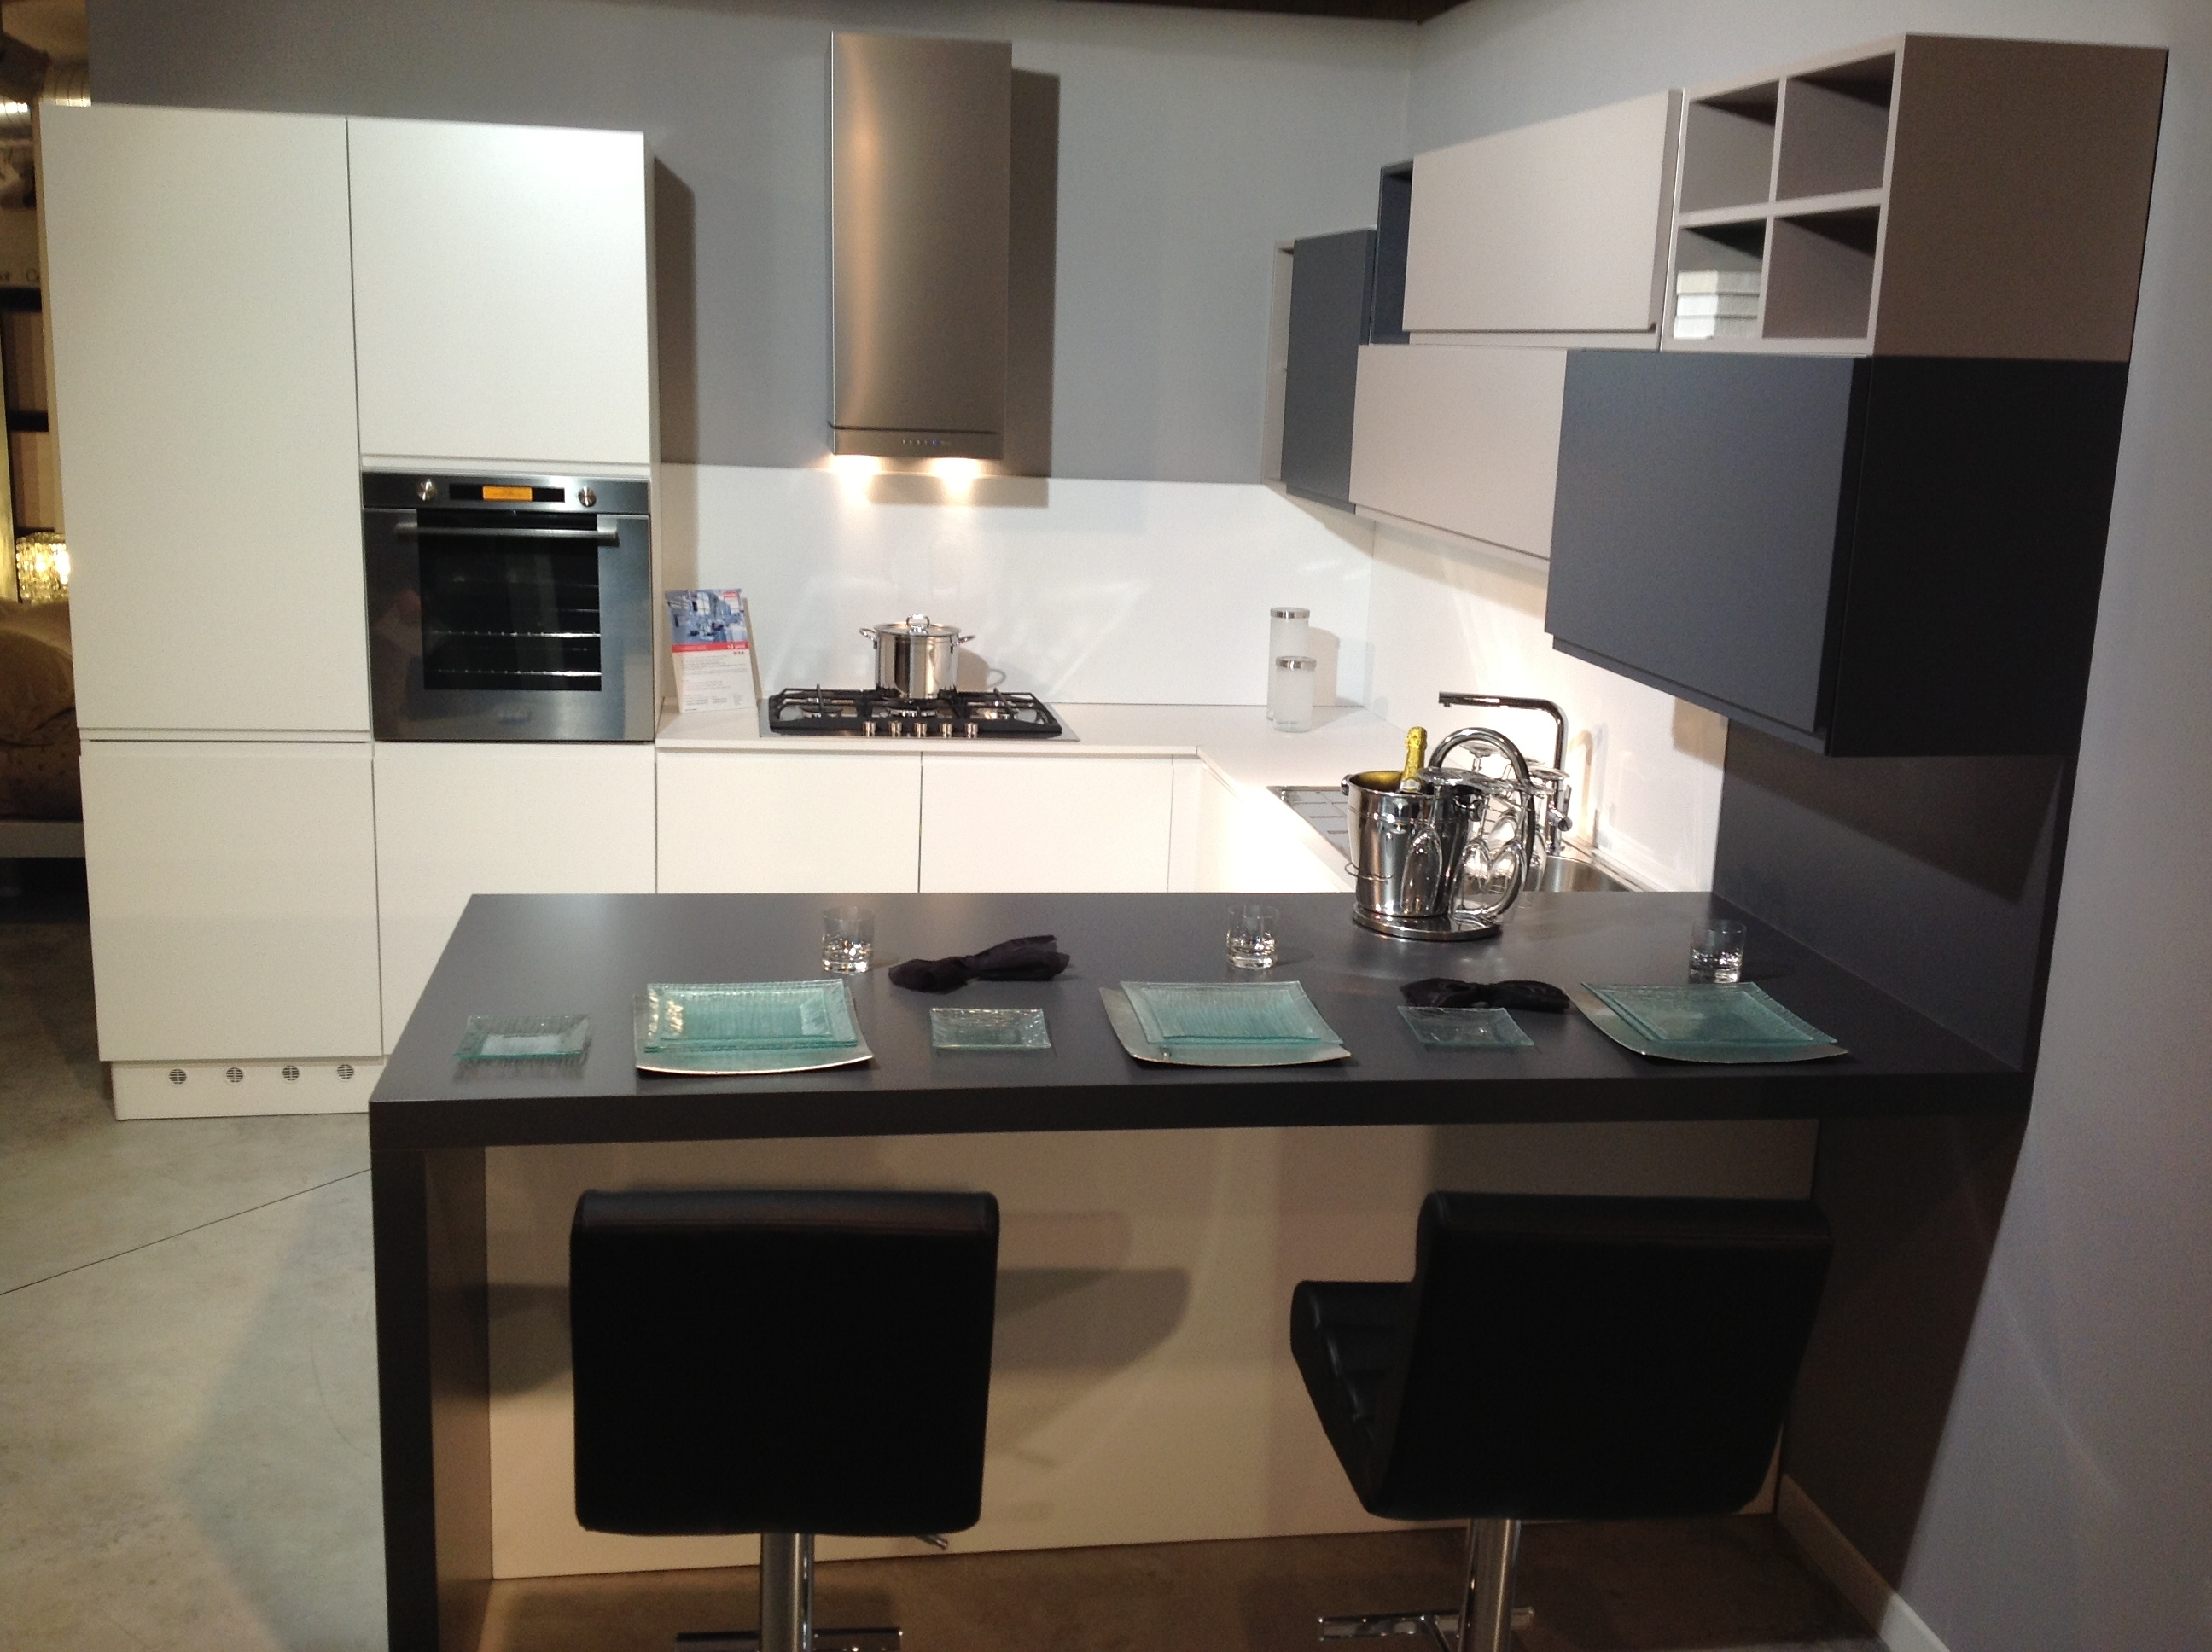 Maniglie per mobili vendita on line - Cucina laccata opaca ...